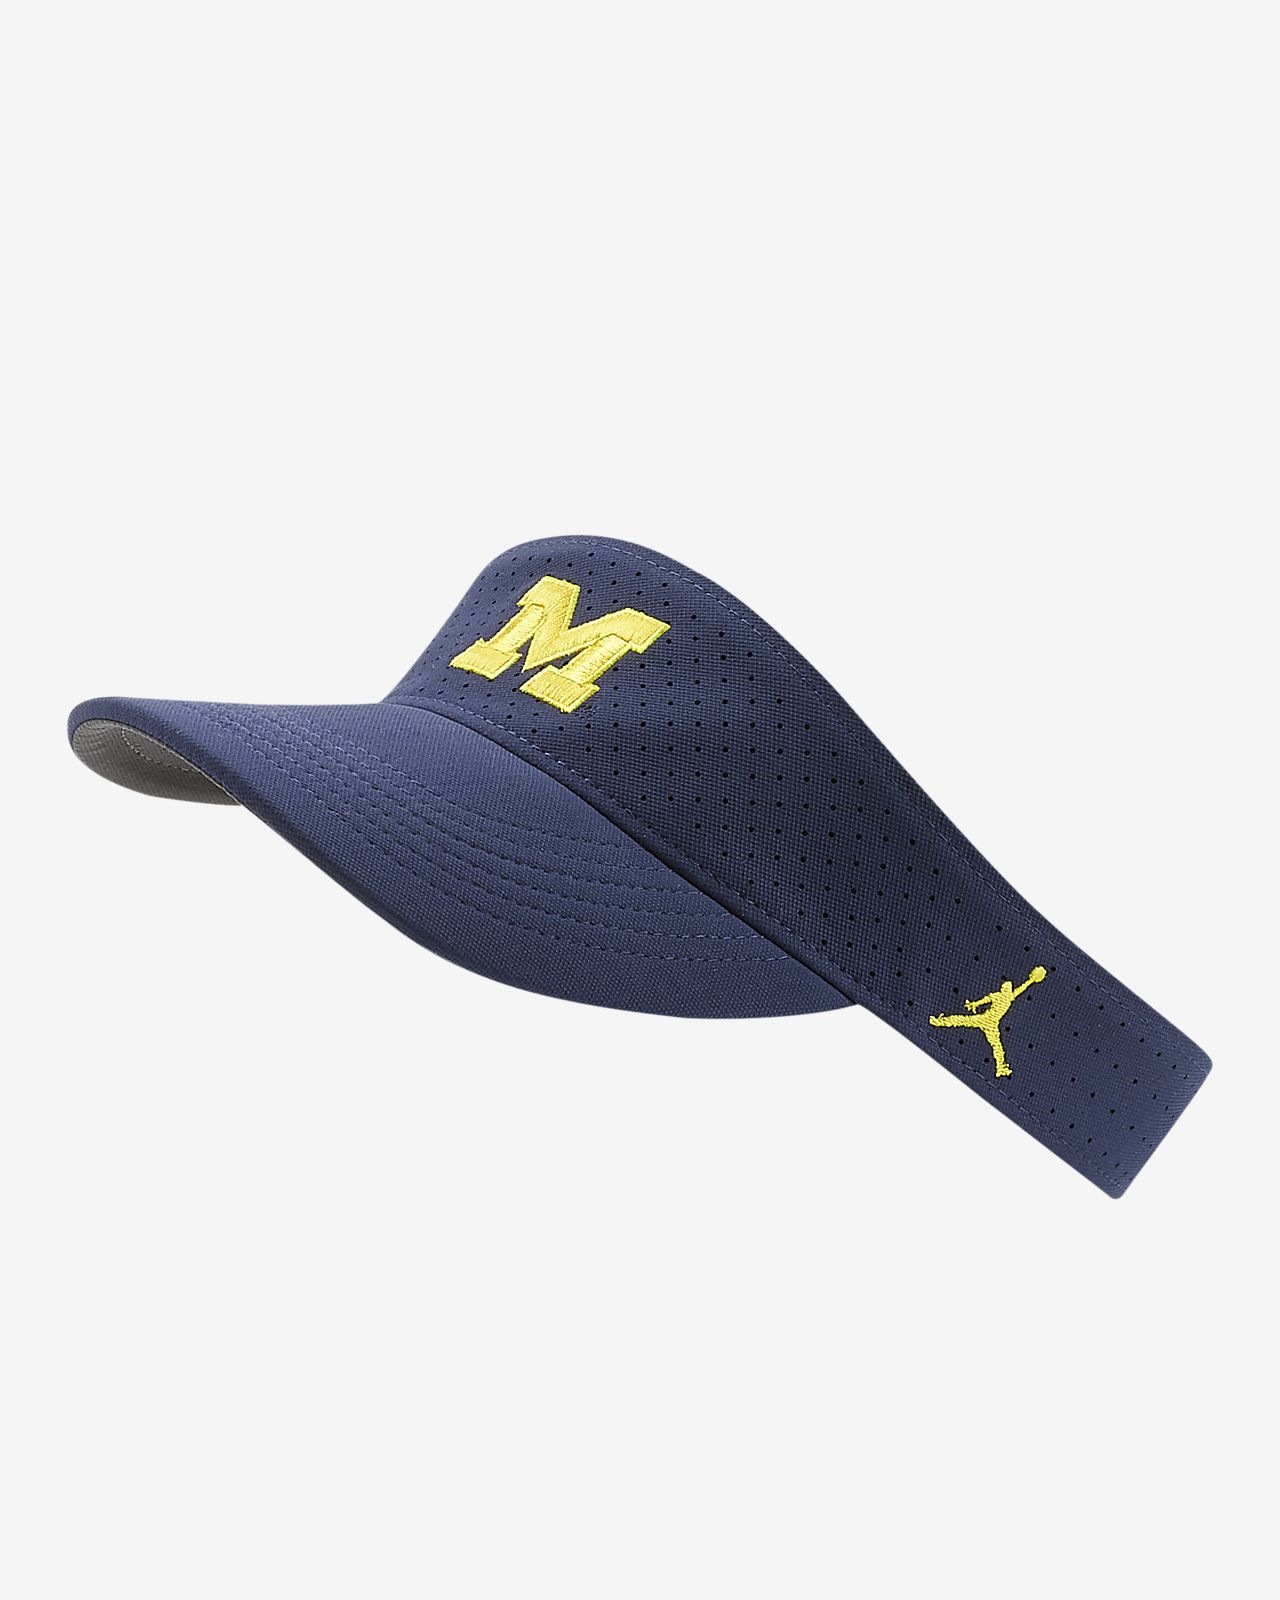 Jordan College AeroBill Sideline (Michigan) Visor